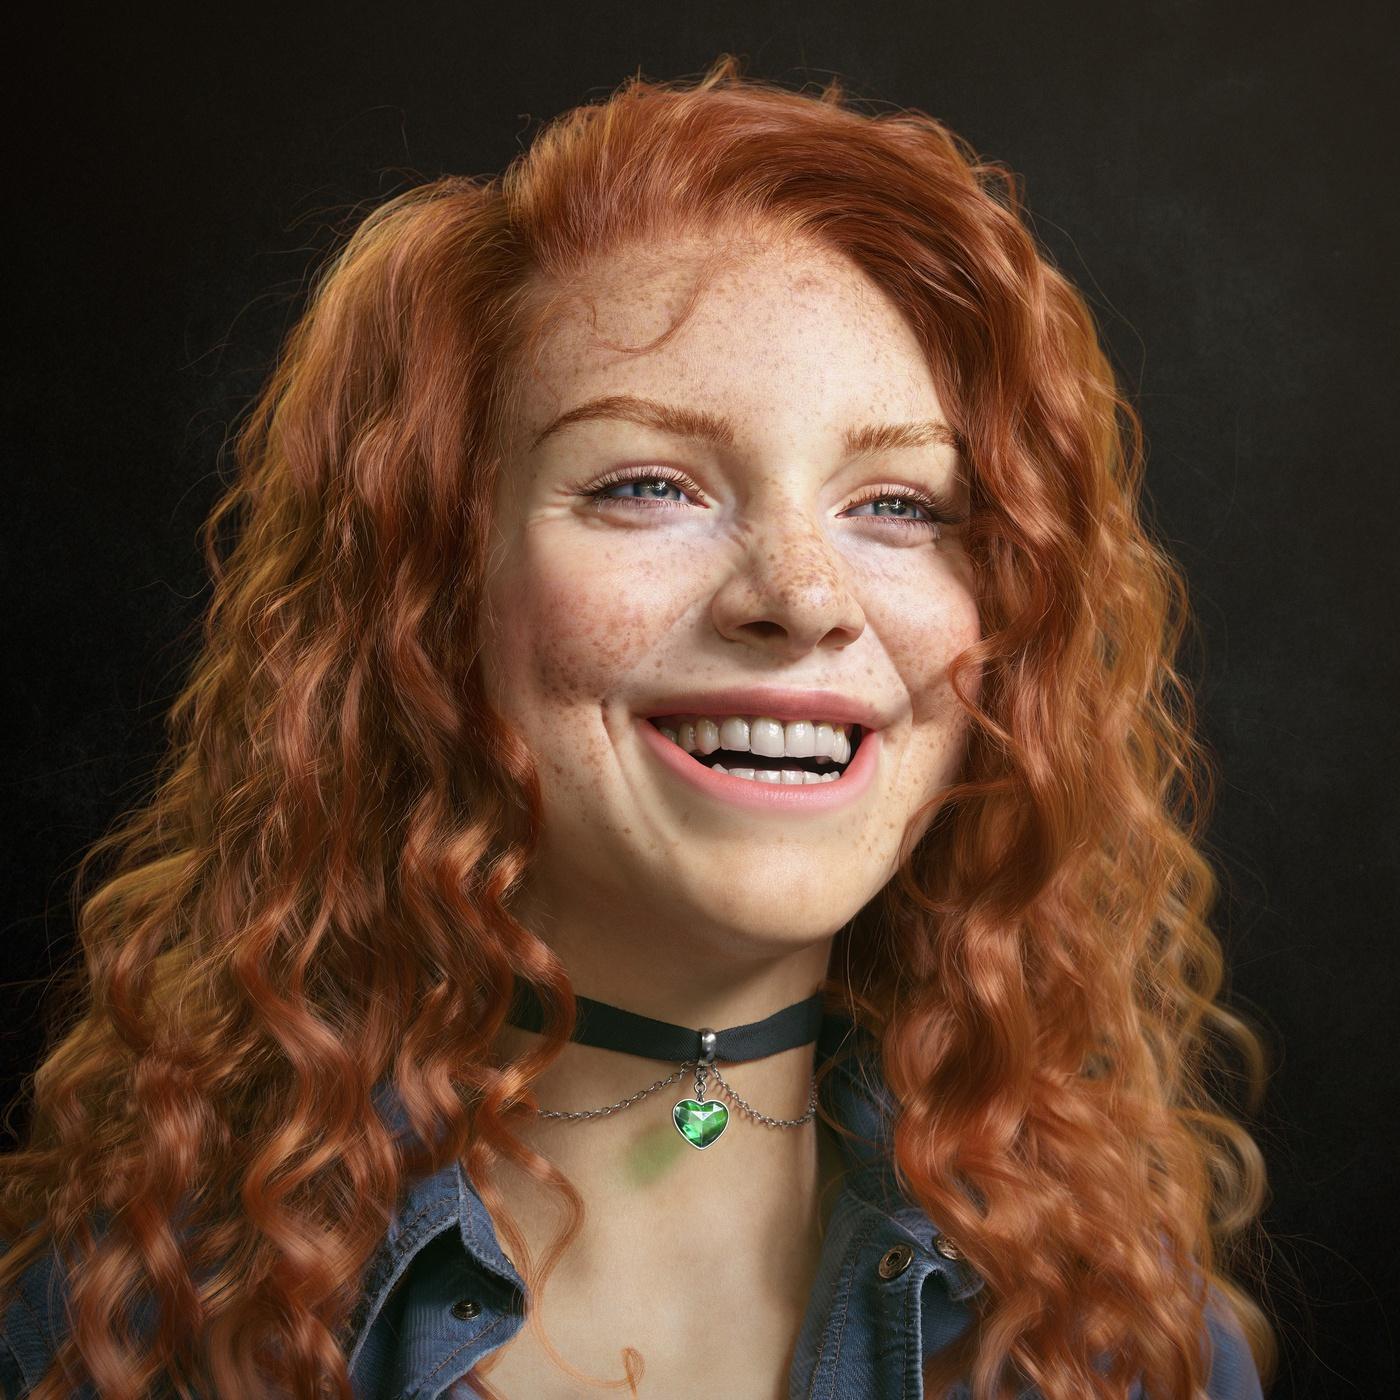 red head girl model render woman smile 3d